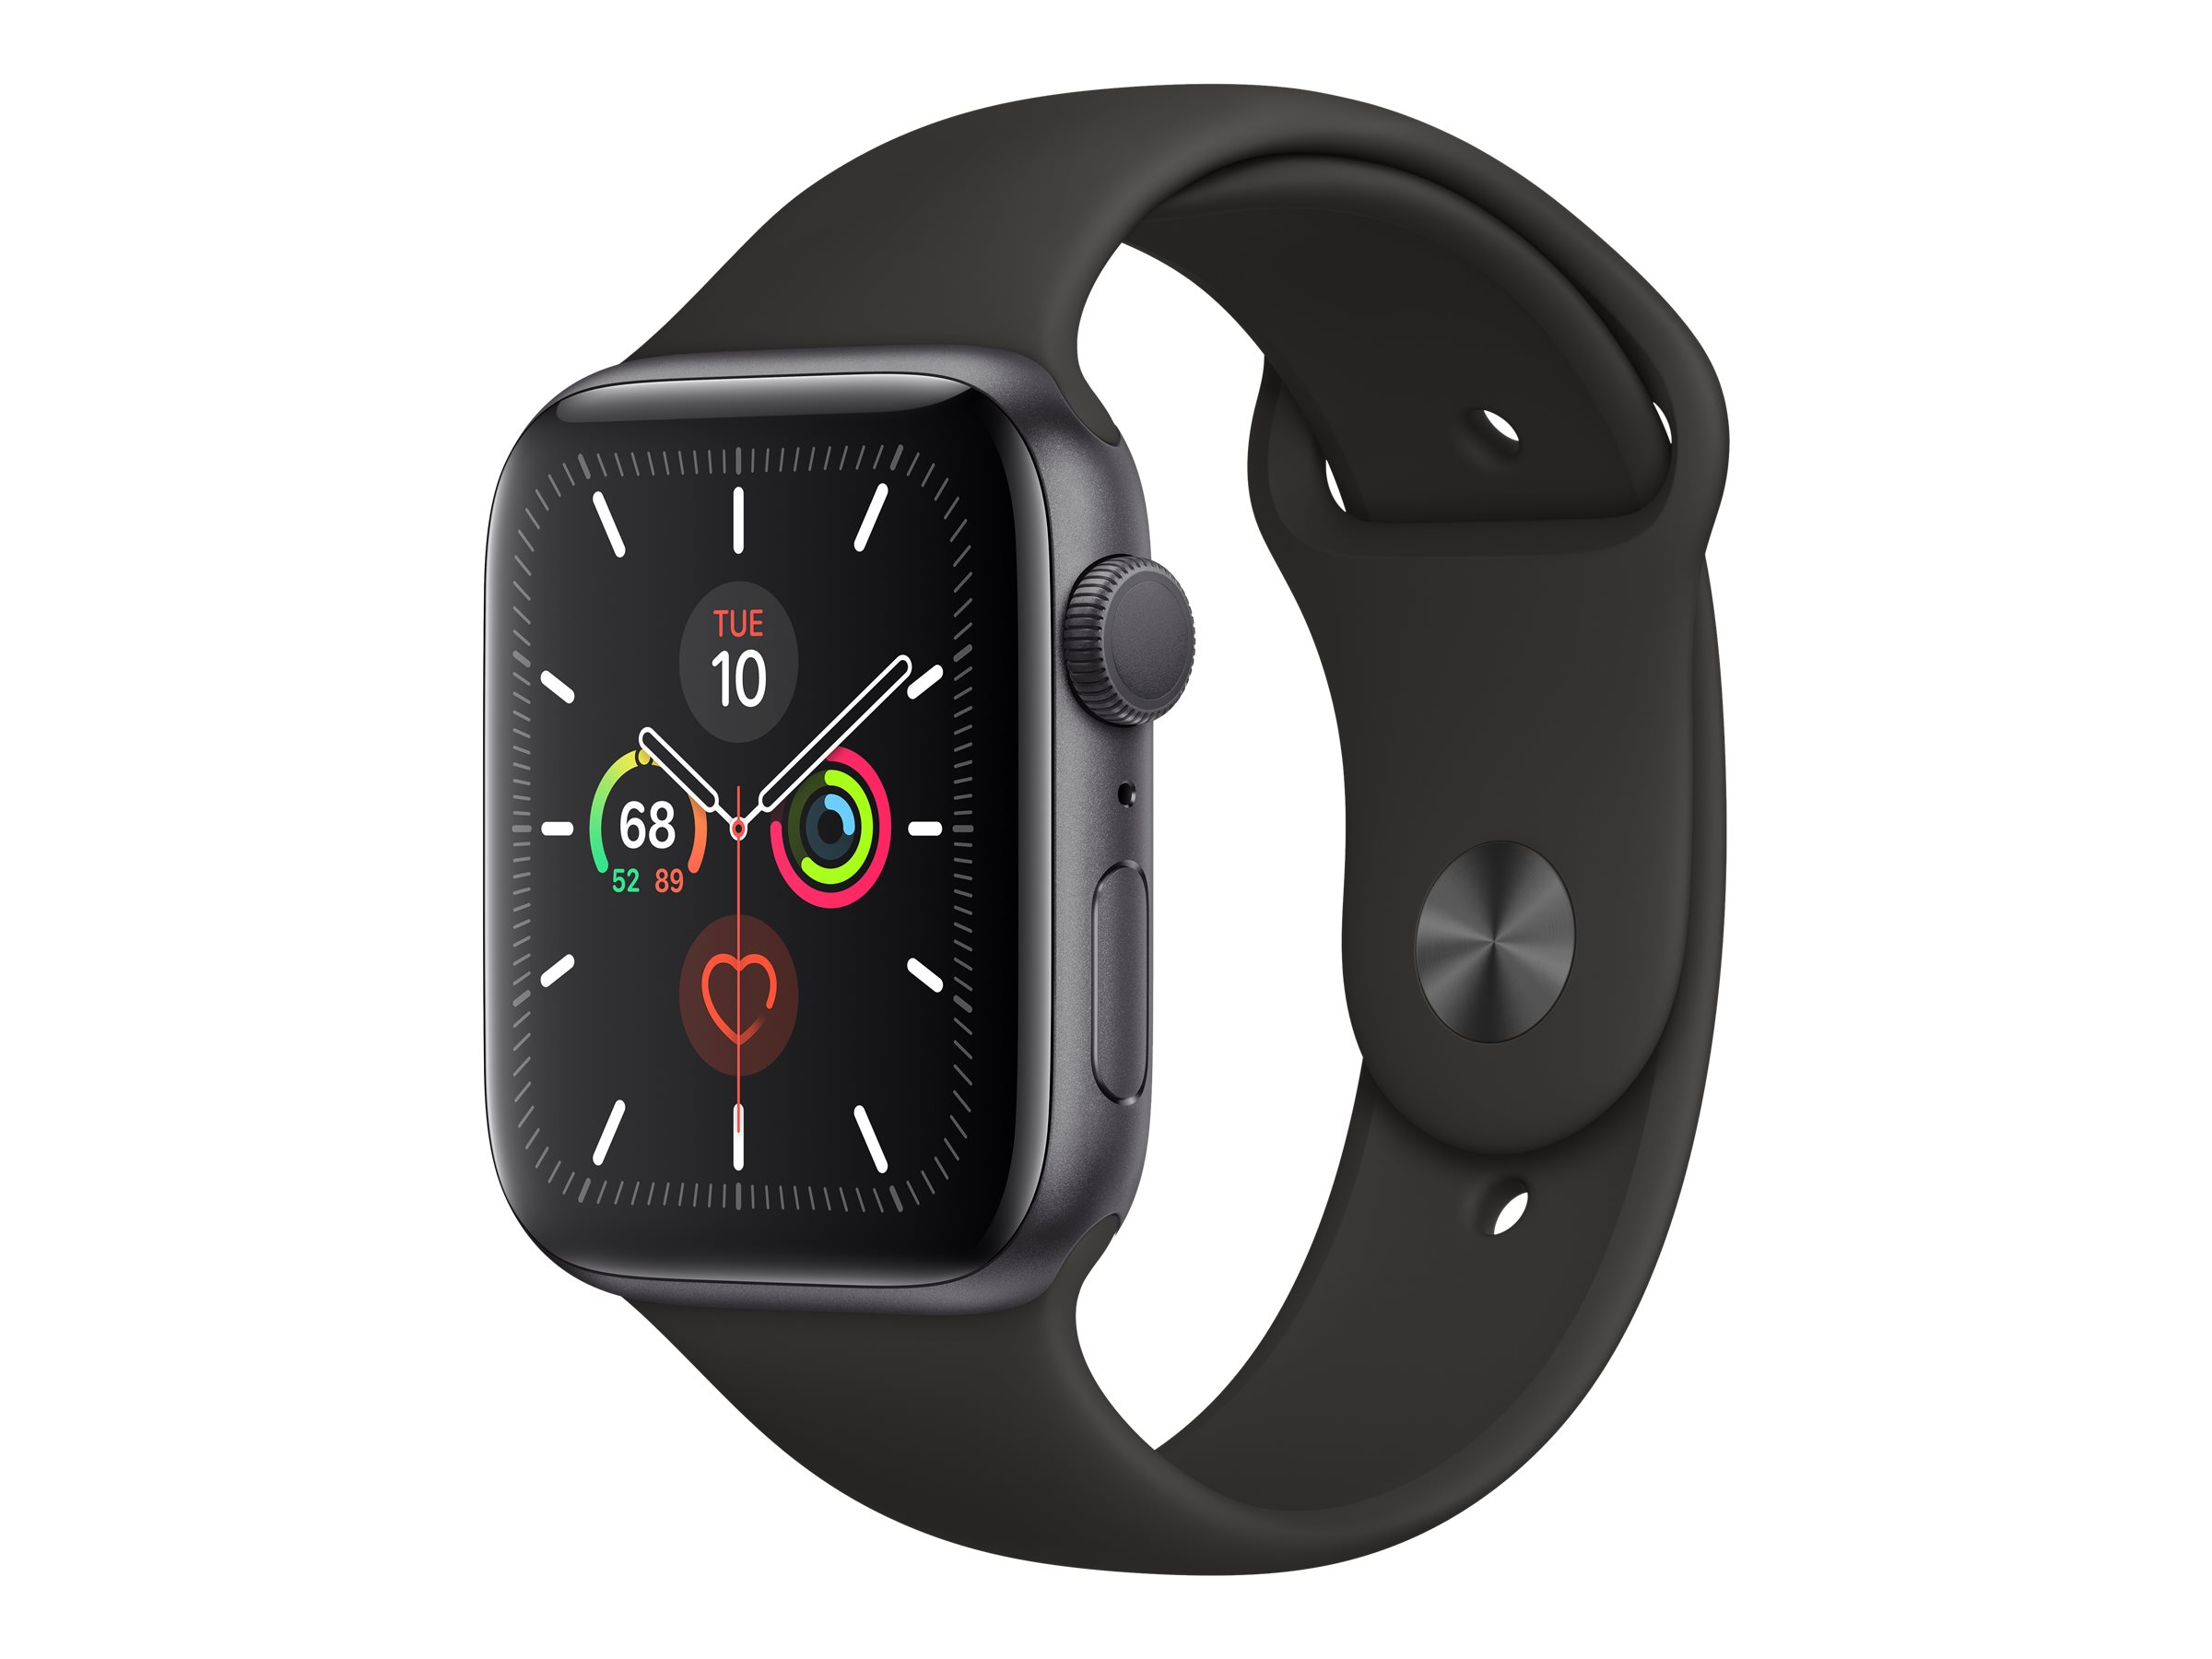 Apple Watch Series 5 (GPS + Cellular) - 44 mm